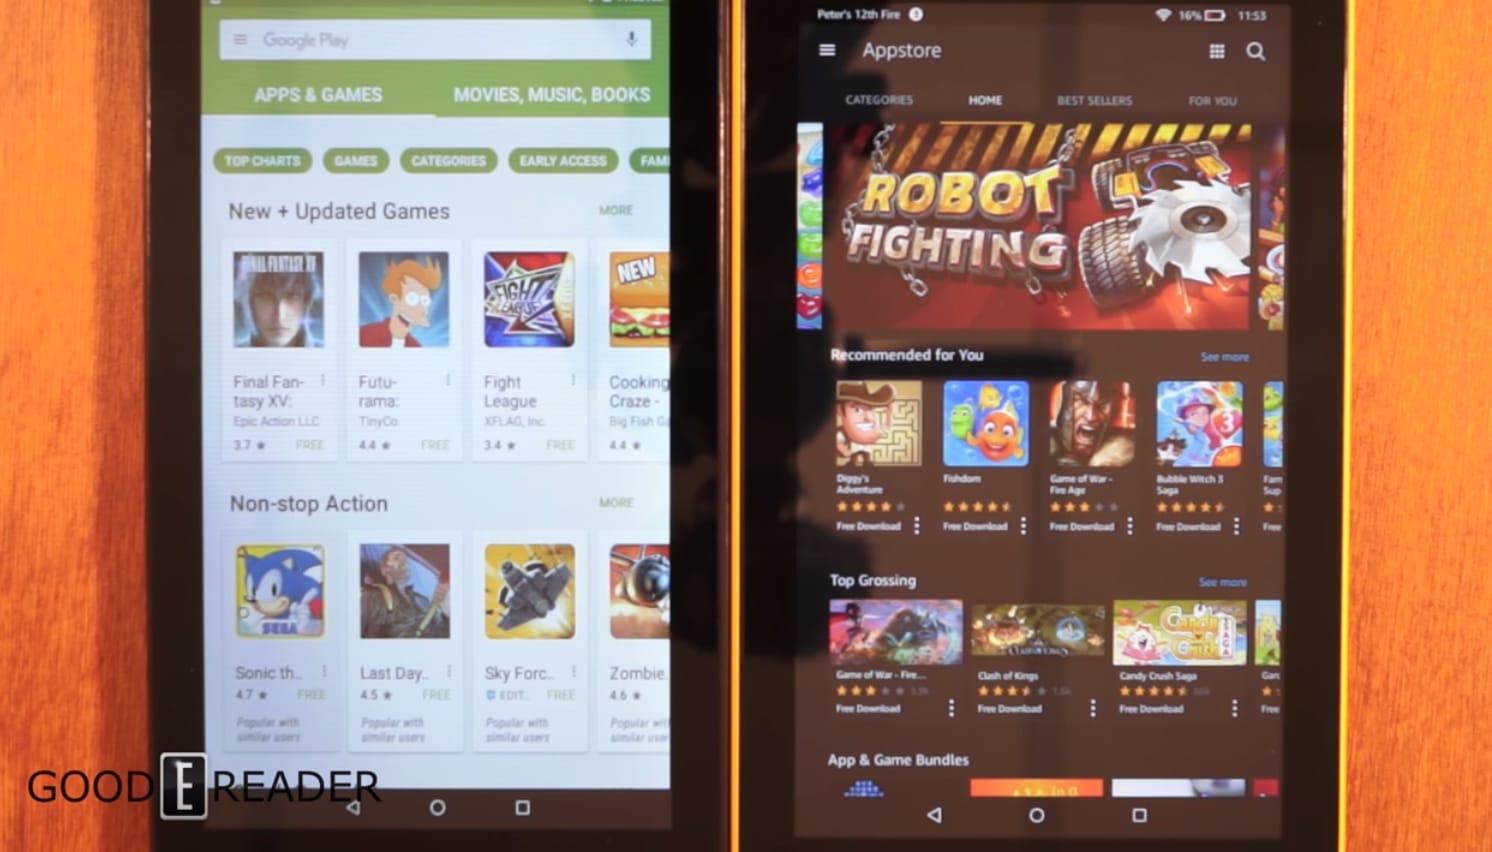 Amazon Fire 7 with Alexa vs Nook Tablet 7